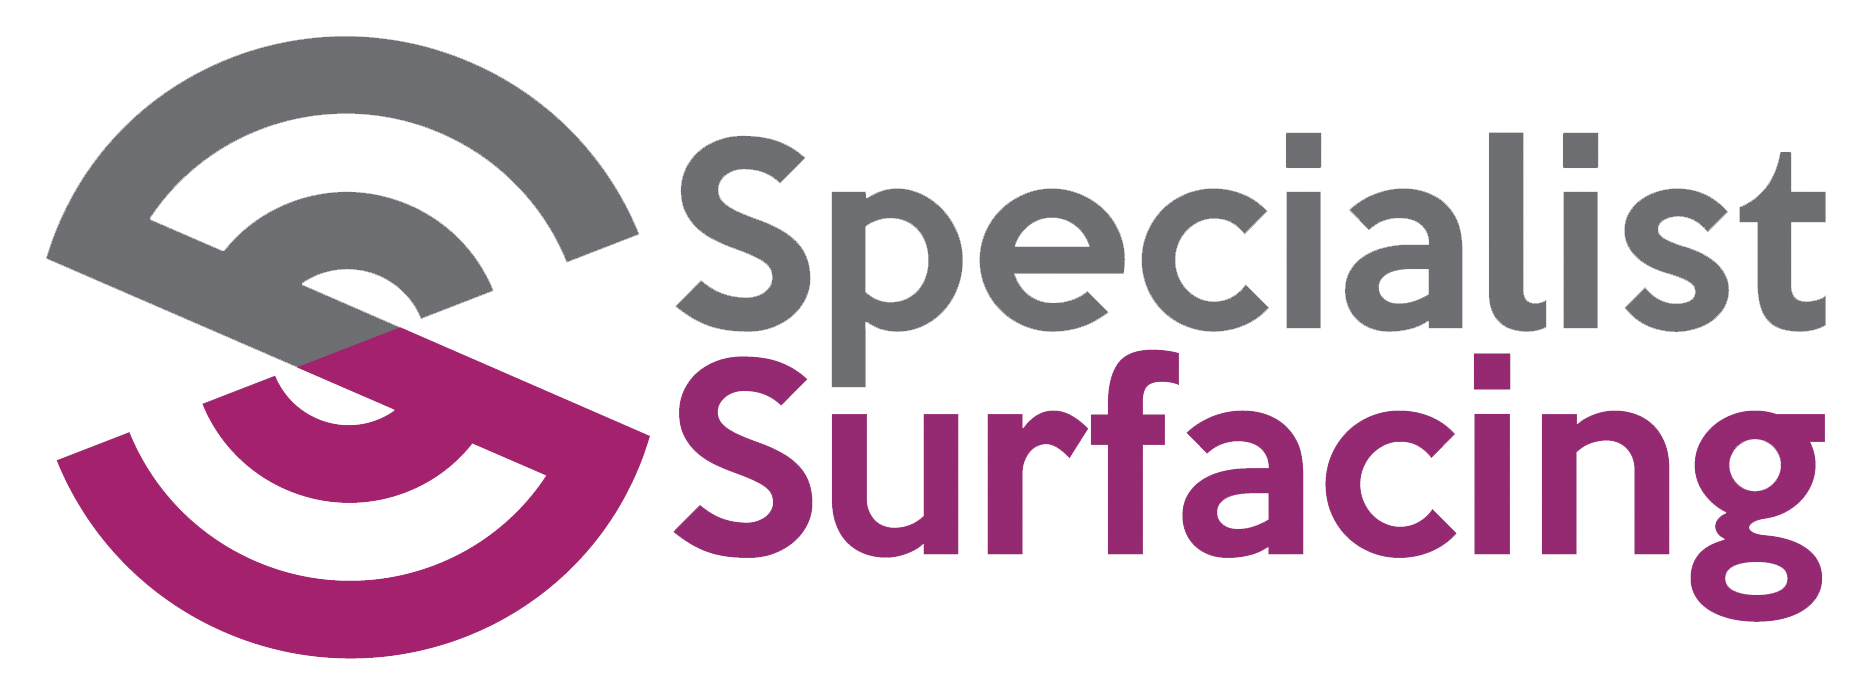 Specialist Surfacing